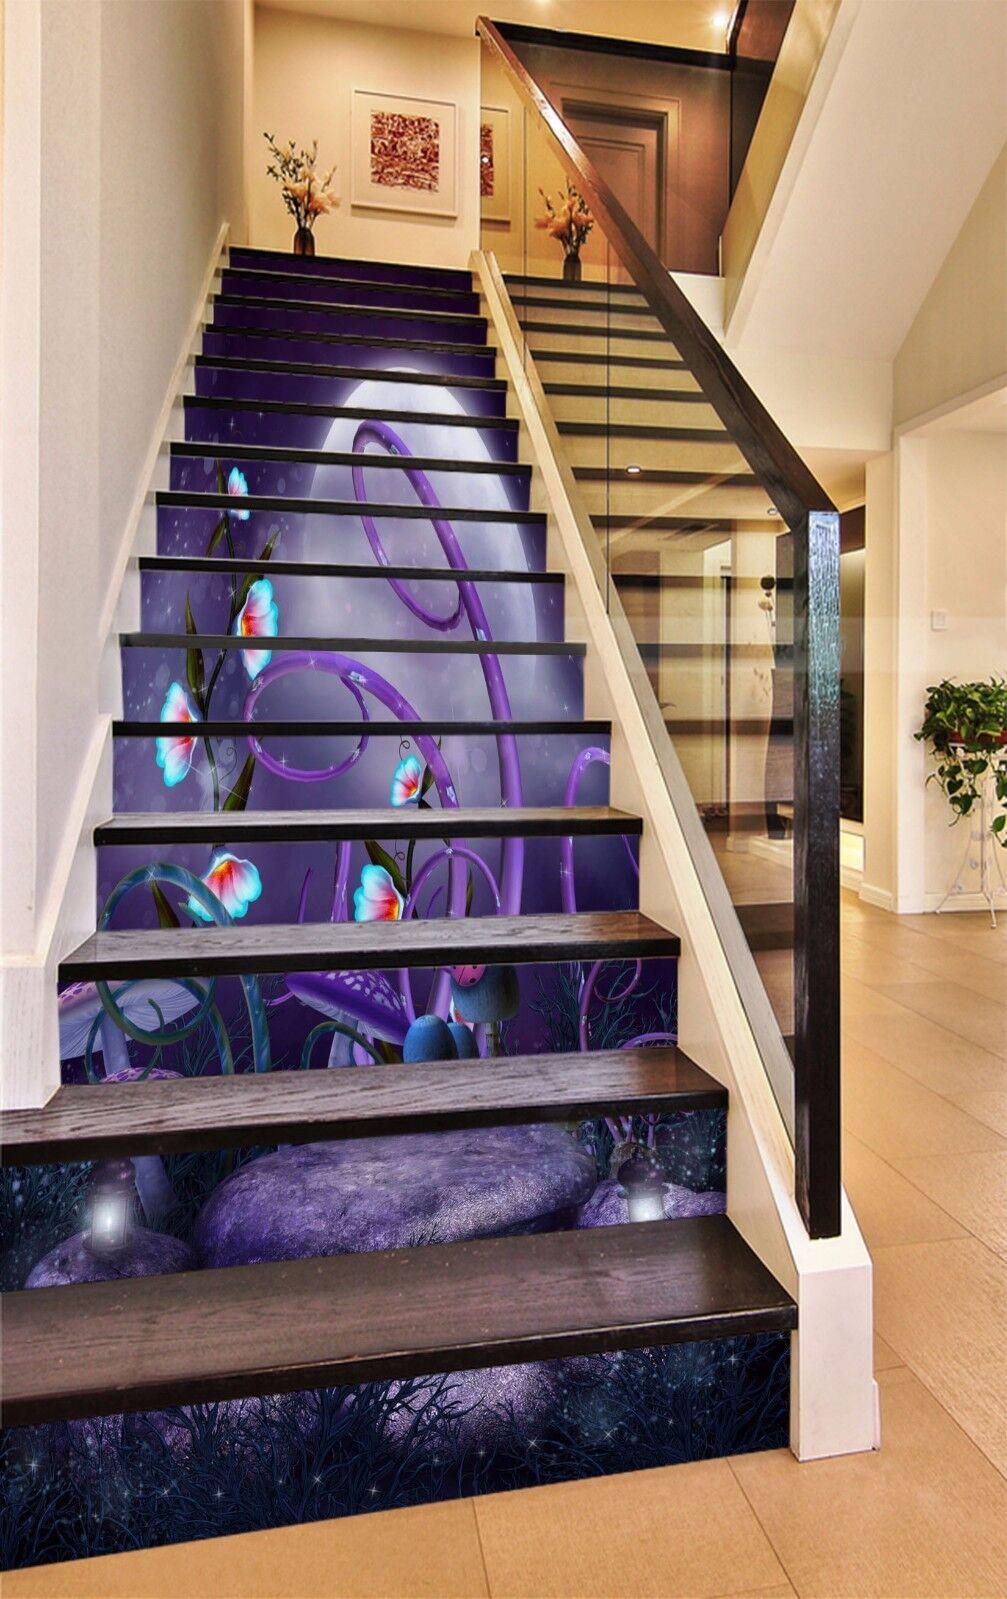 3D Moon Mushroom 72 Stair Risers Decoration Photo Mural Vinyl Decal WandPapier AU